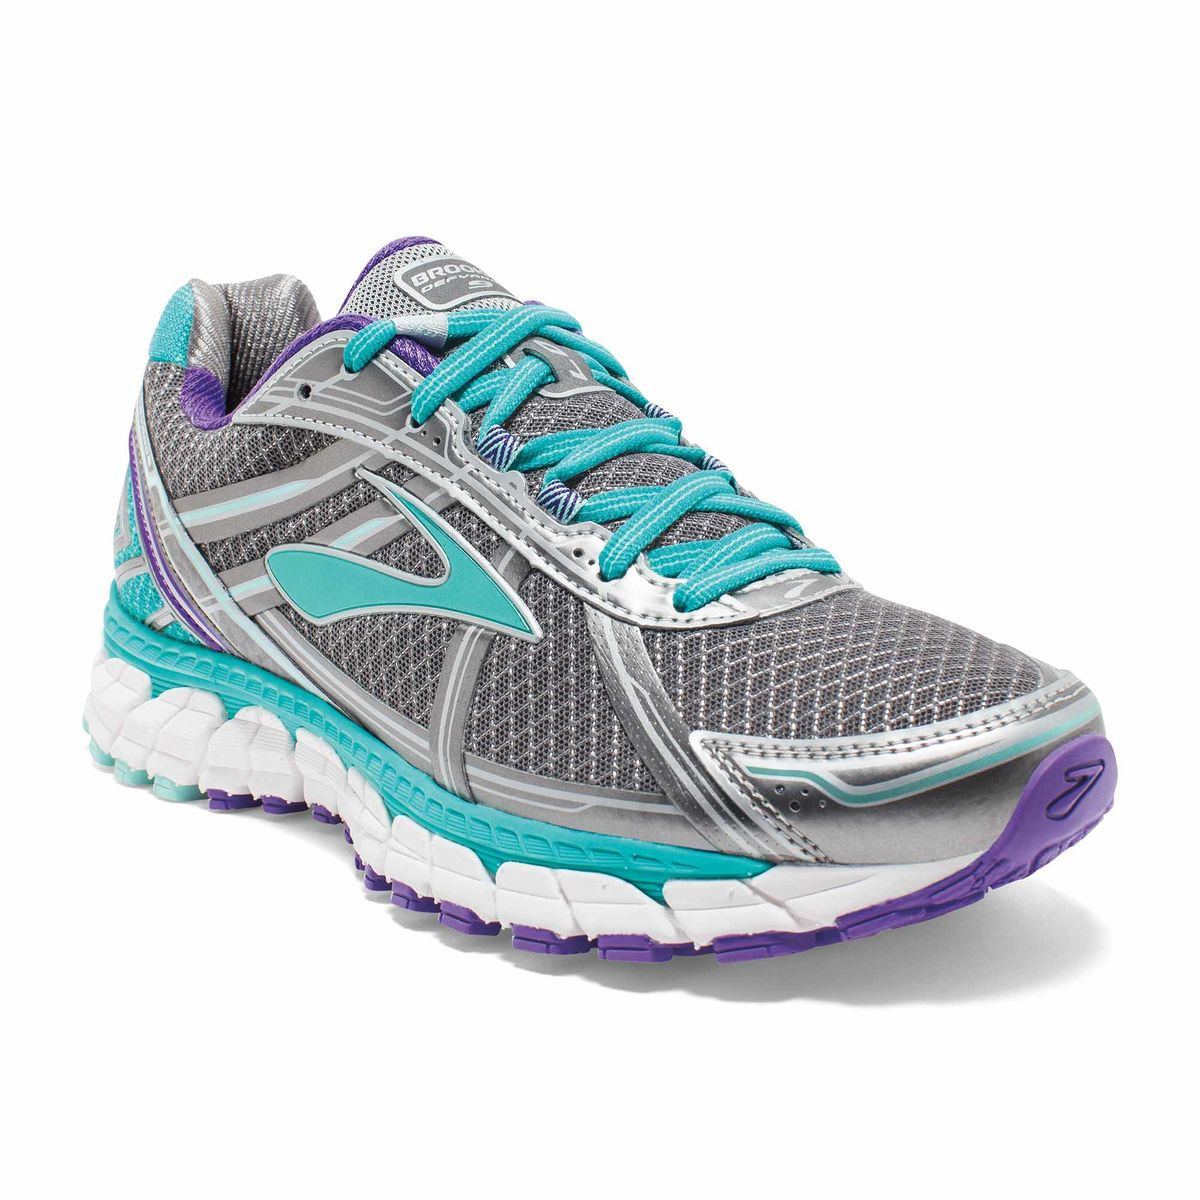 c77ad4ac0f396 brooks ghost running shoes women